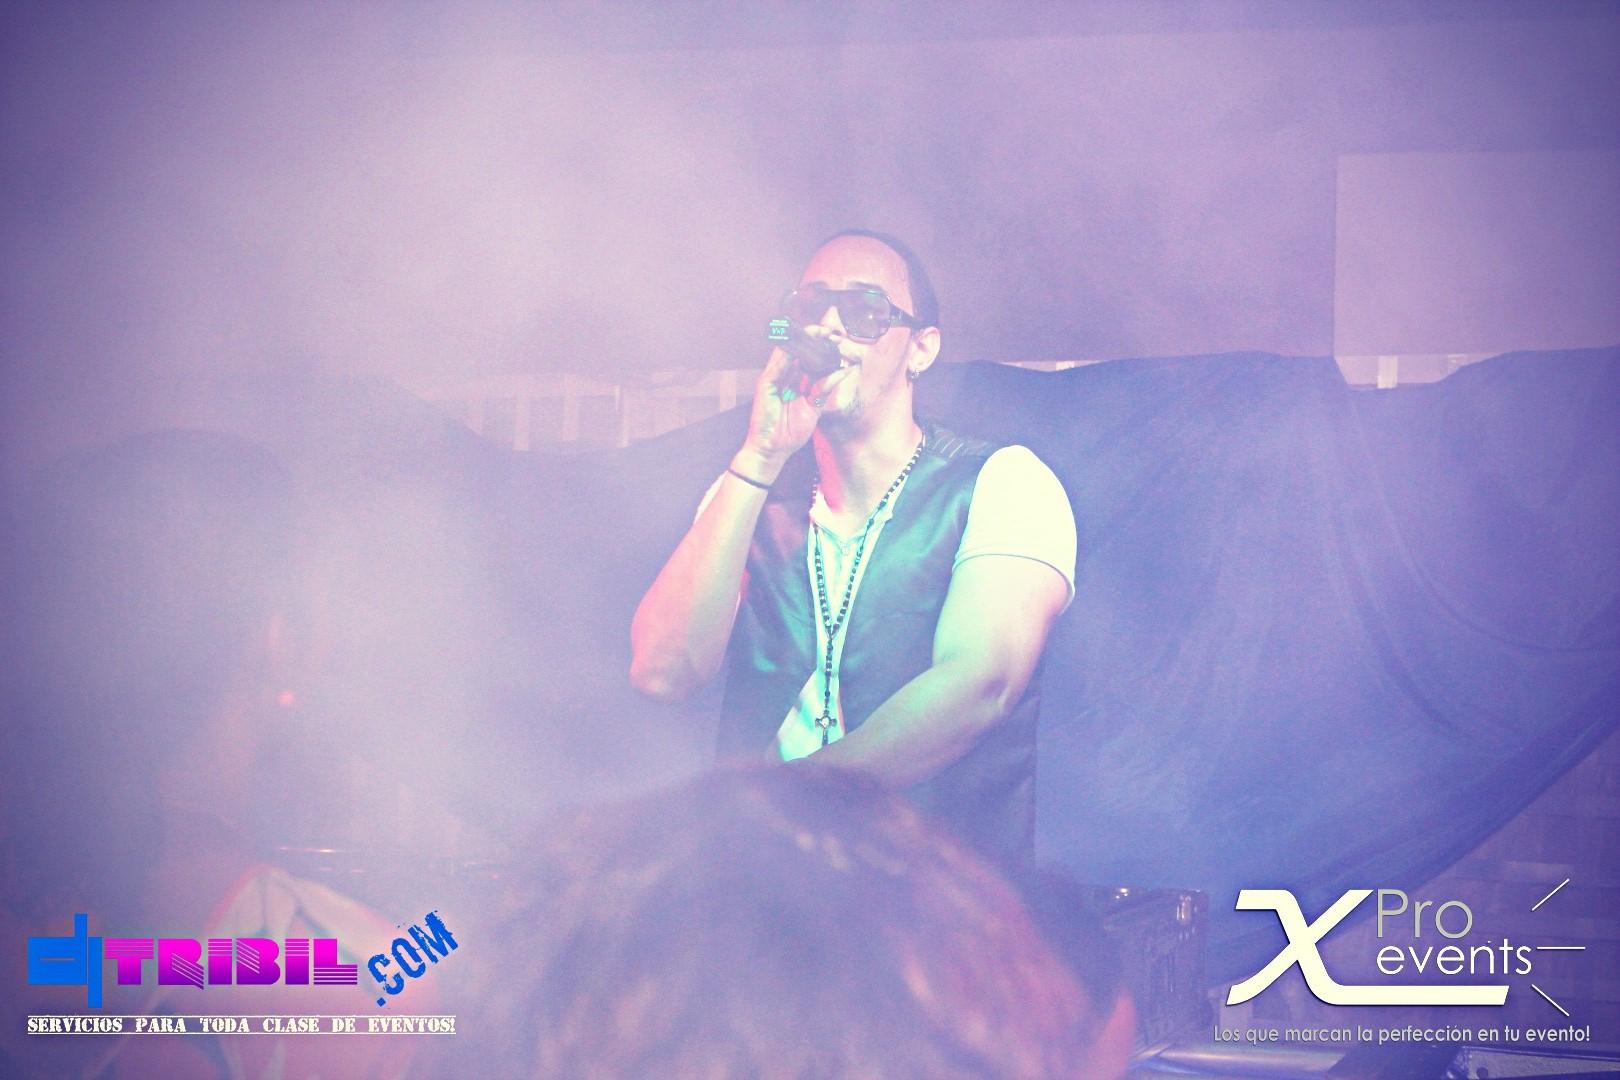 www.Xproevents.com - Djs en vivo.jpg